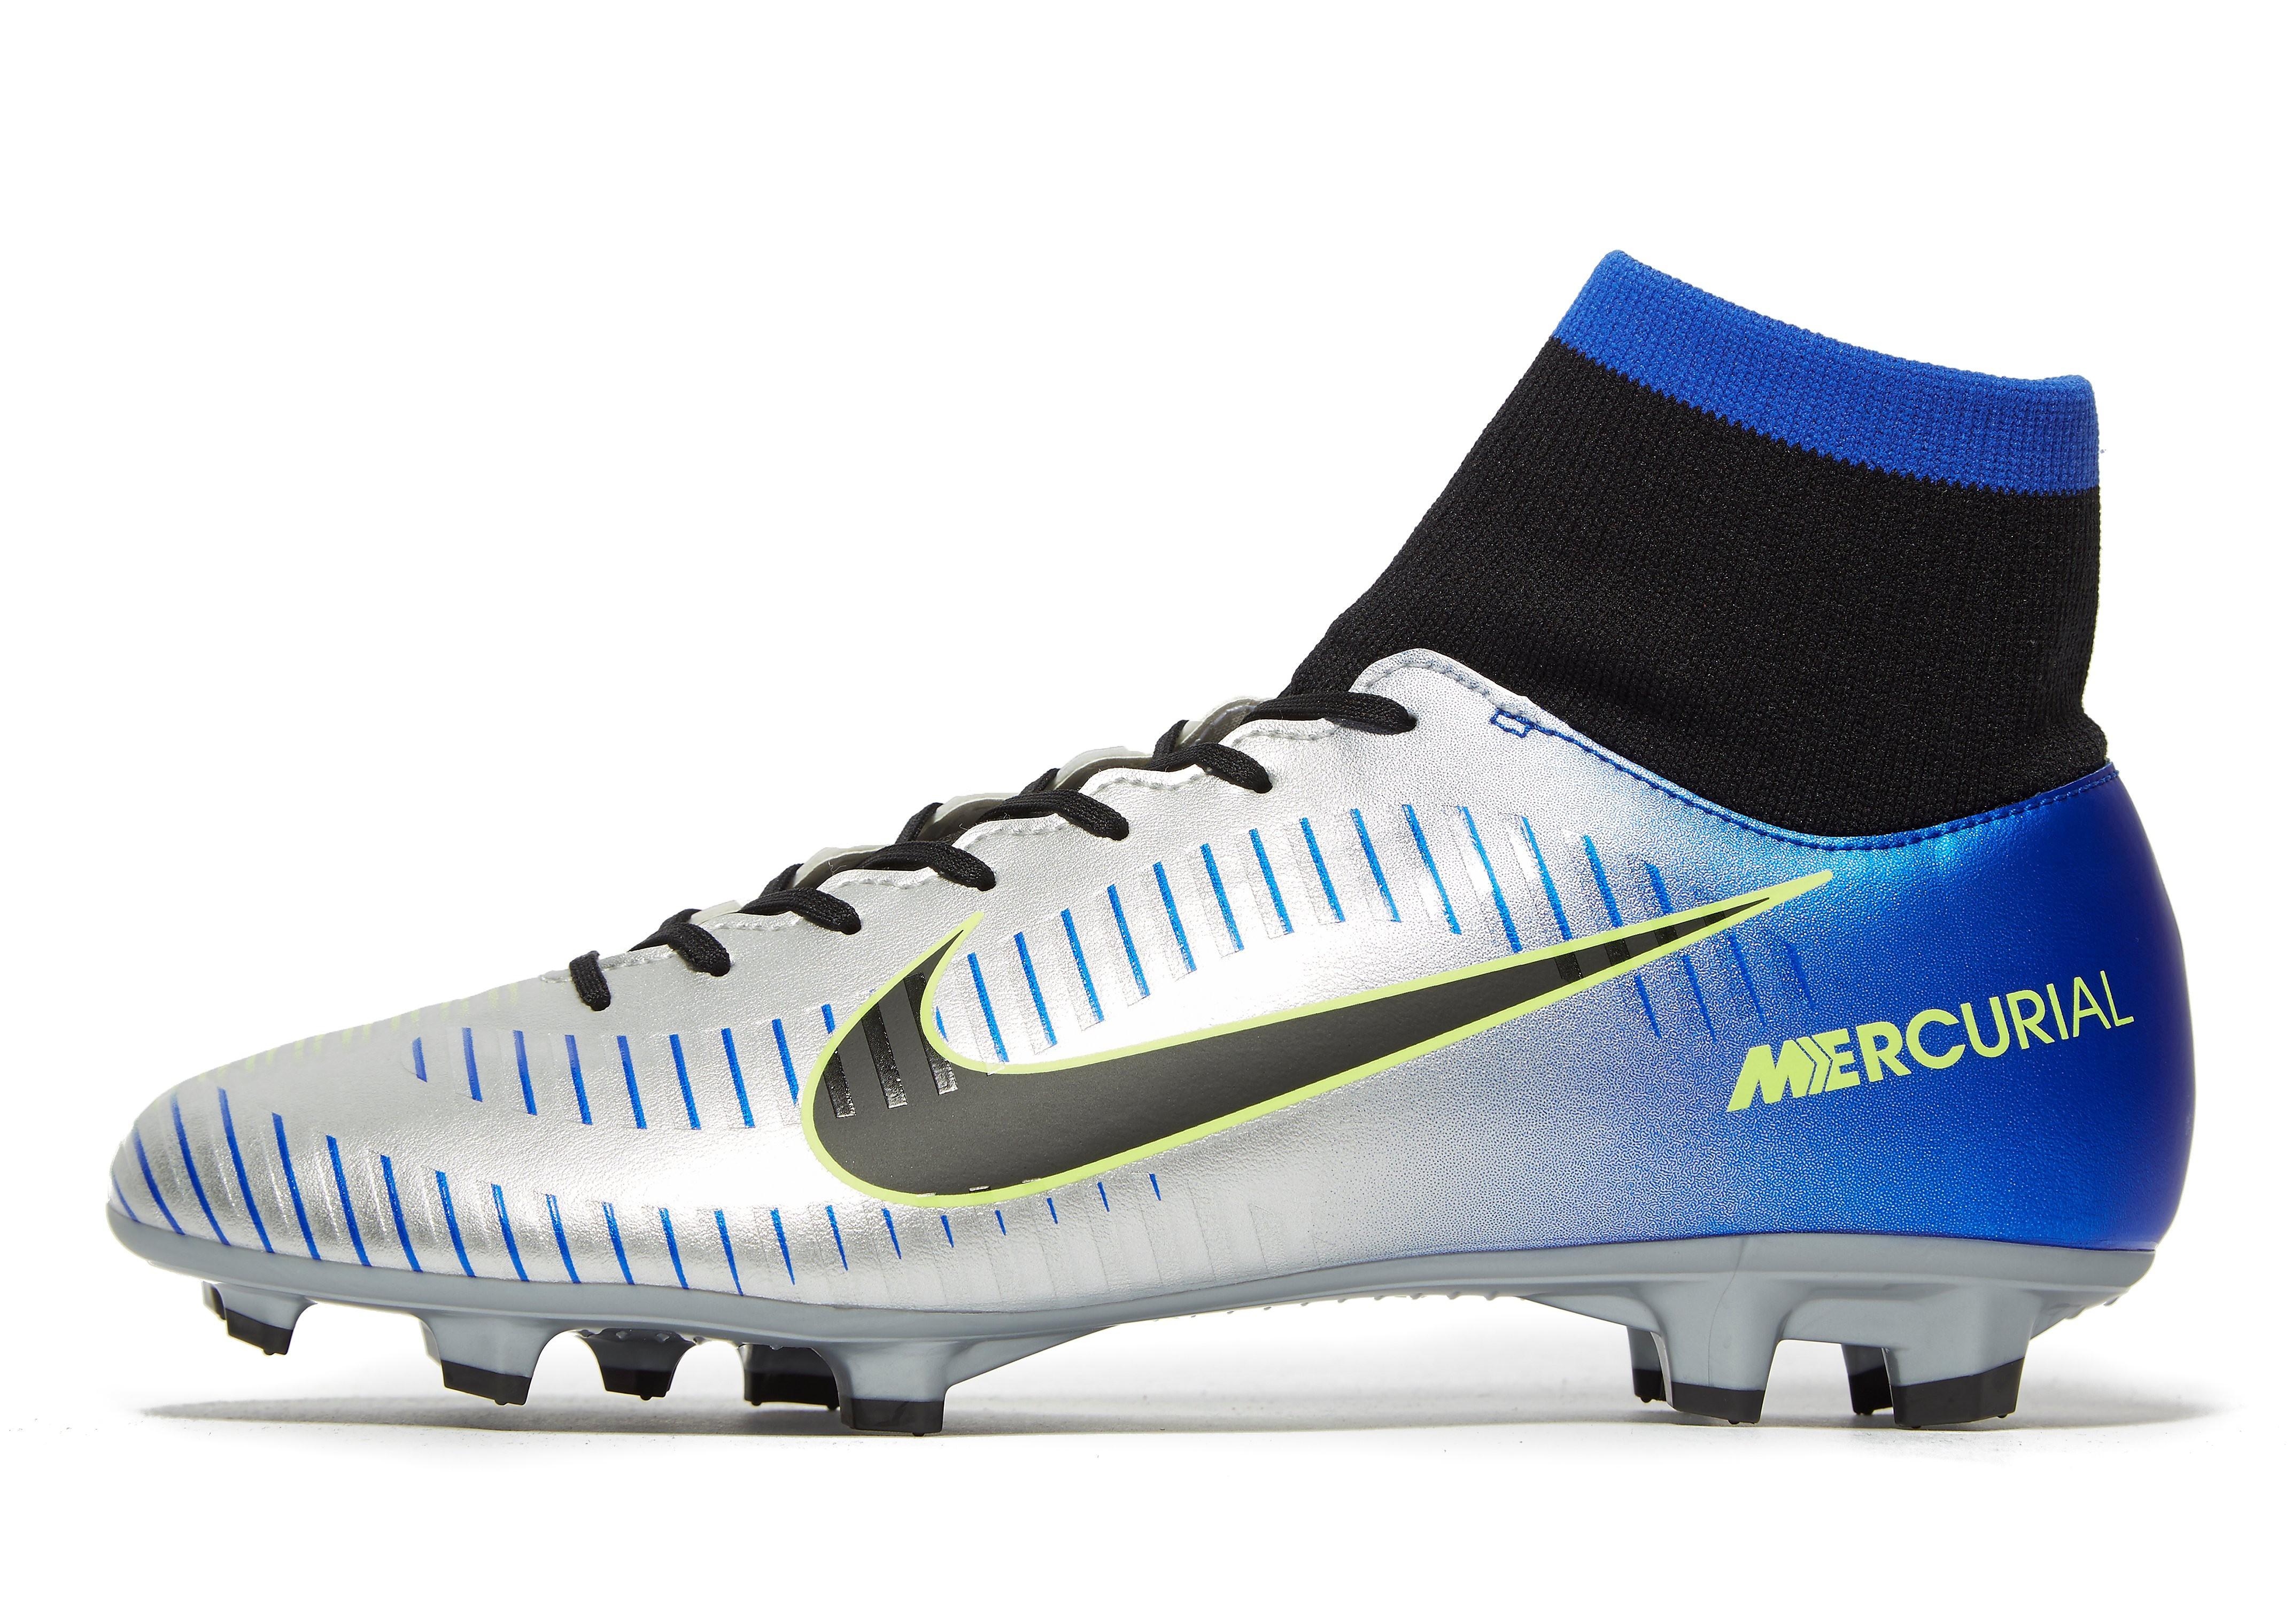 Nike Neymar Jr Mercurial Victory Dynamic Fit VI FG